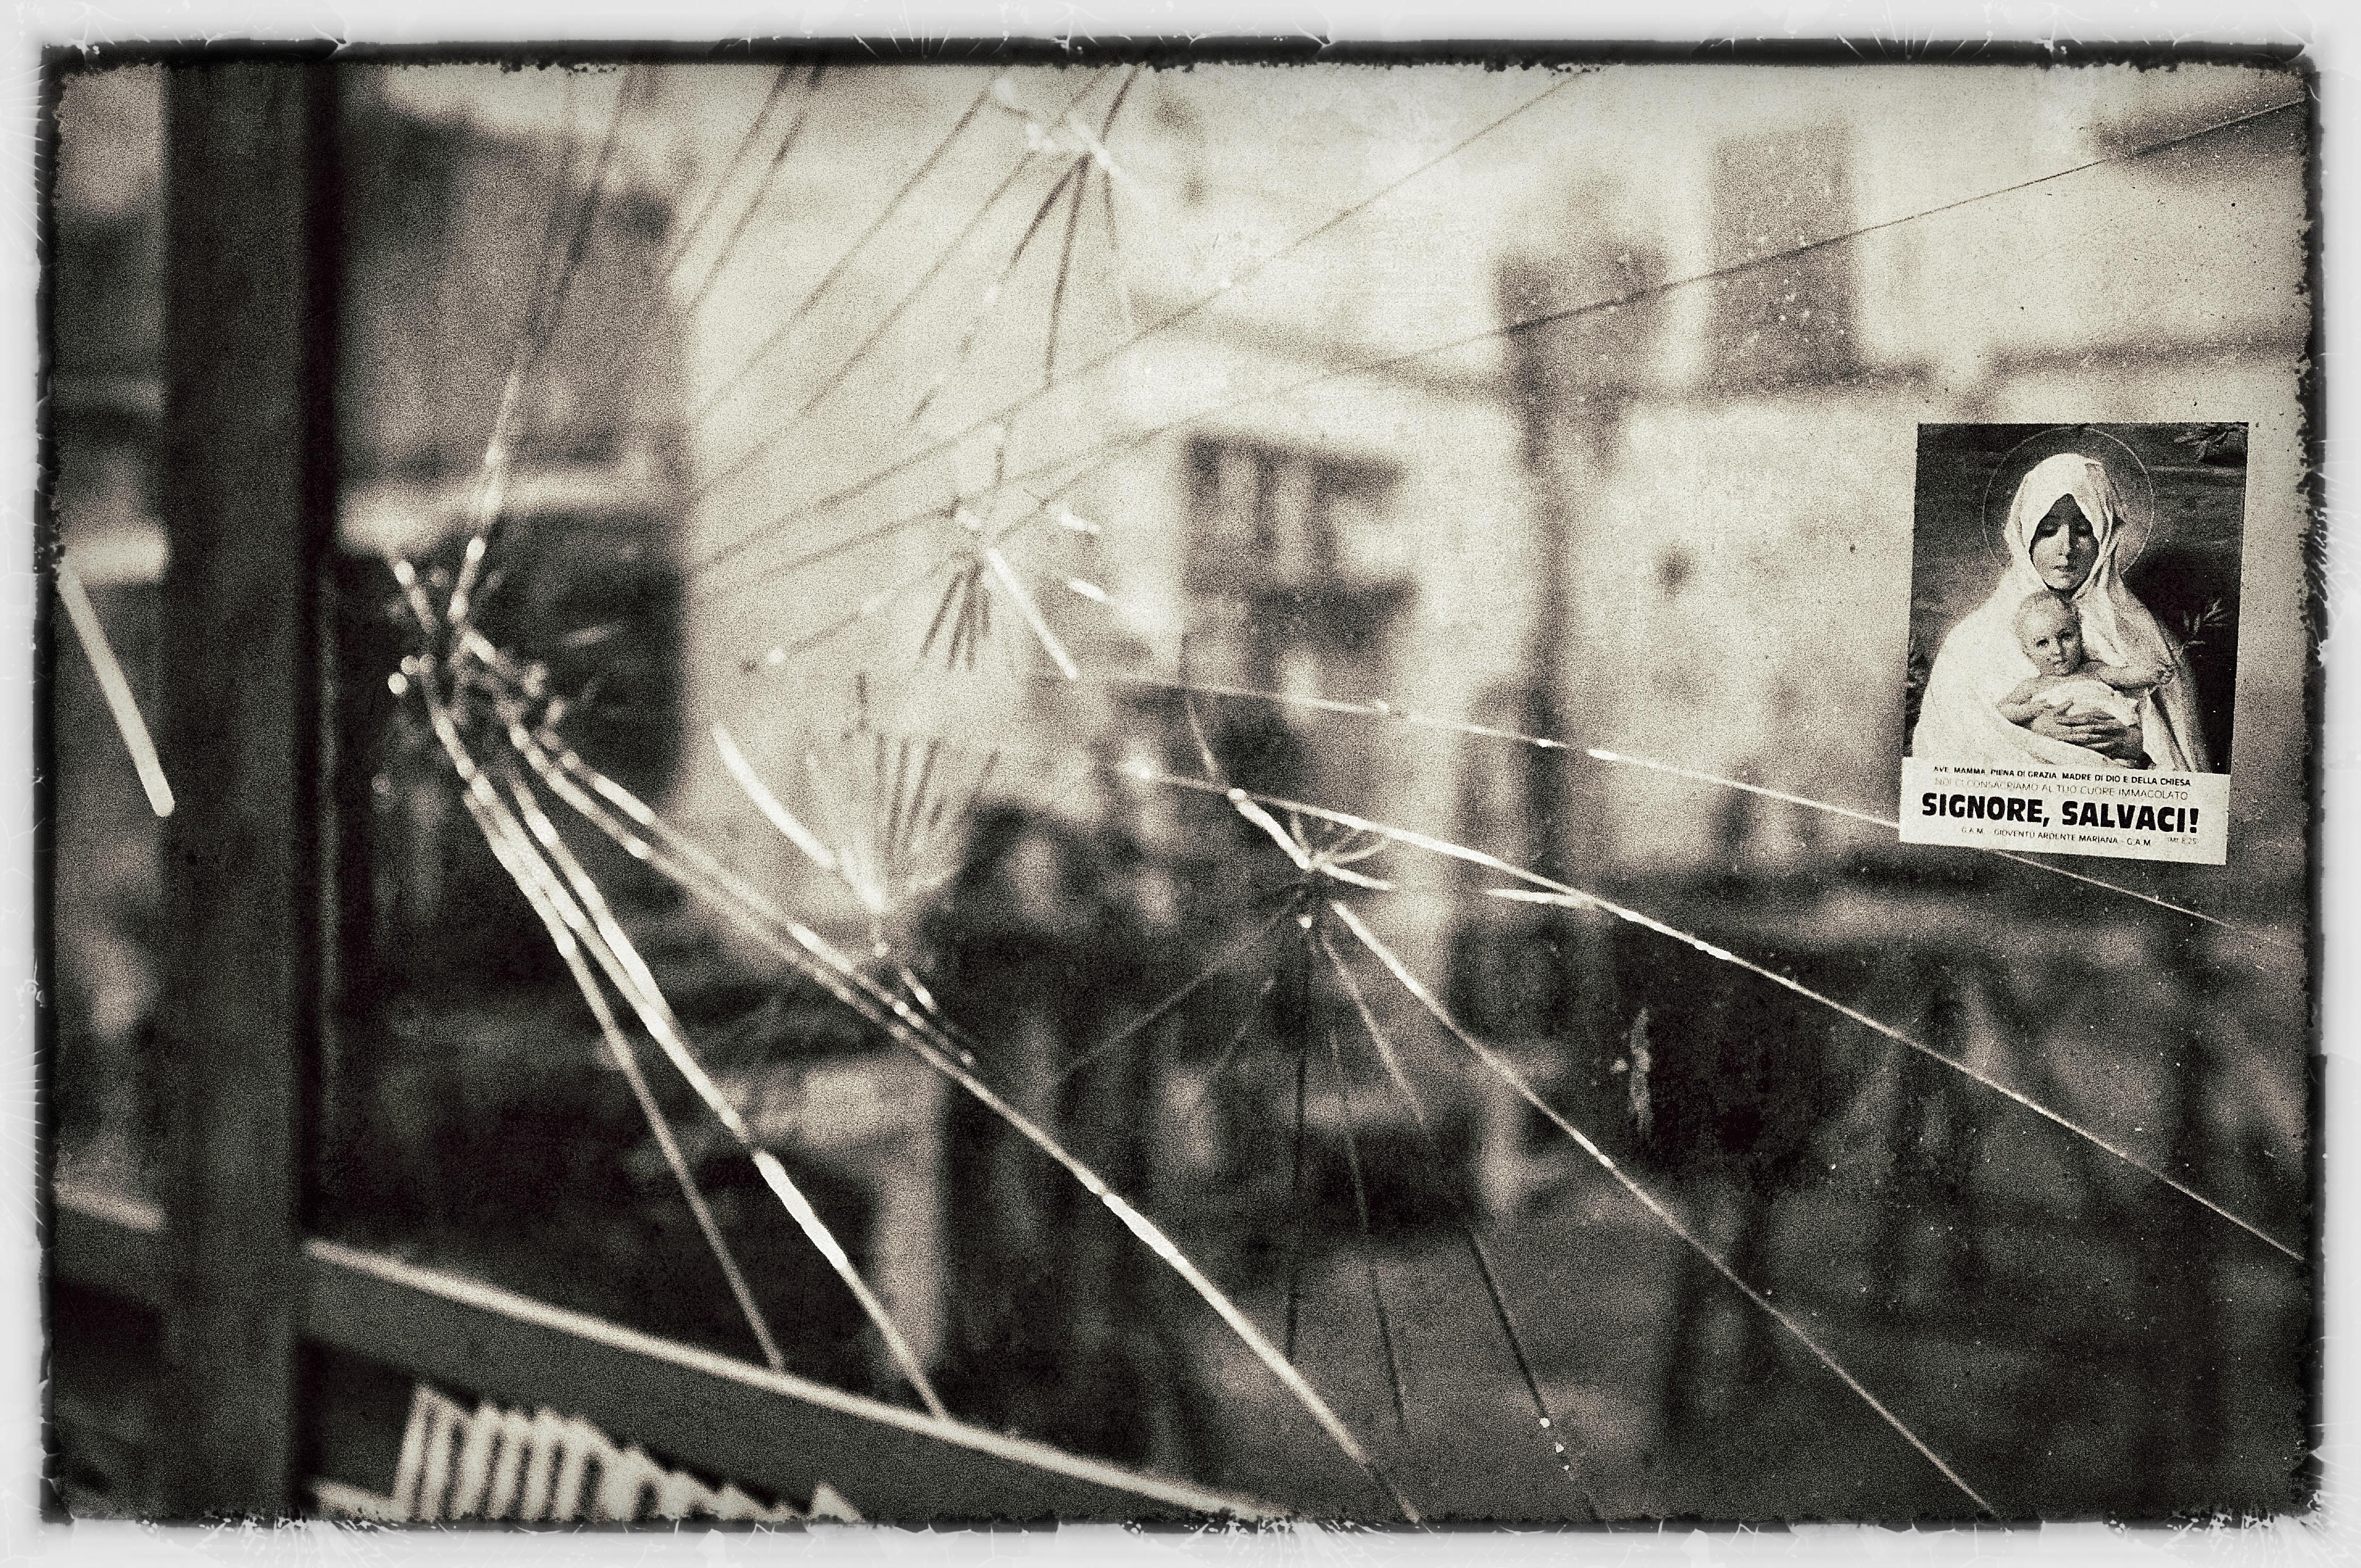 grayscale photo of broken mirror